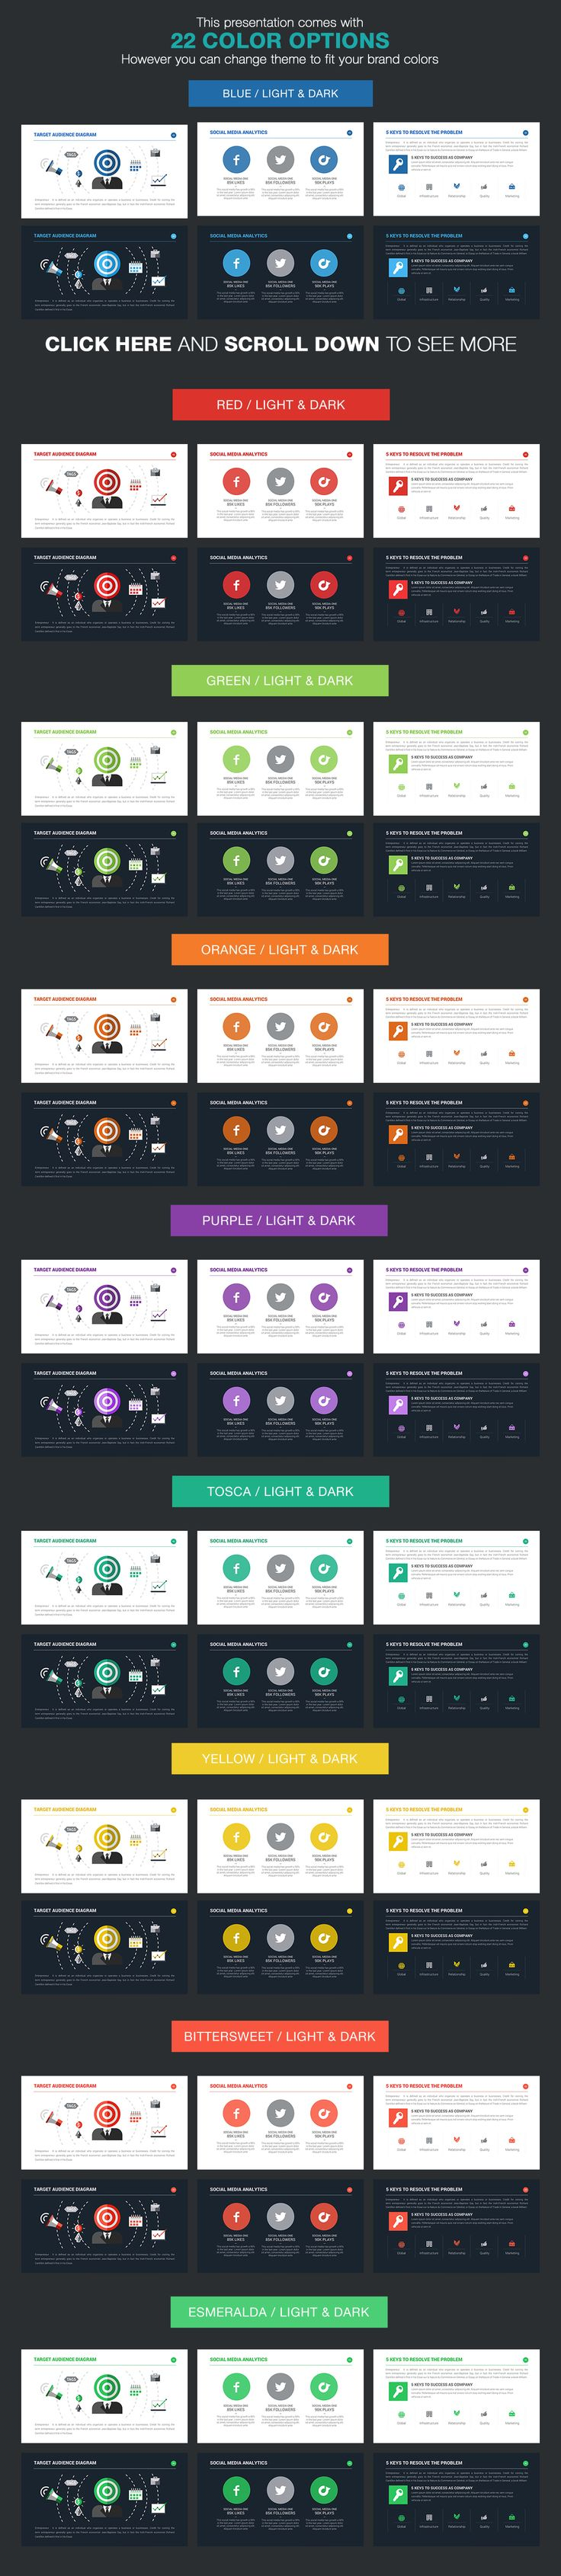 Investor Pitch Deck Powerpoint by Louis Twelve on Creative Market